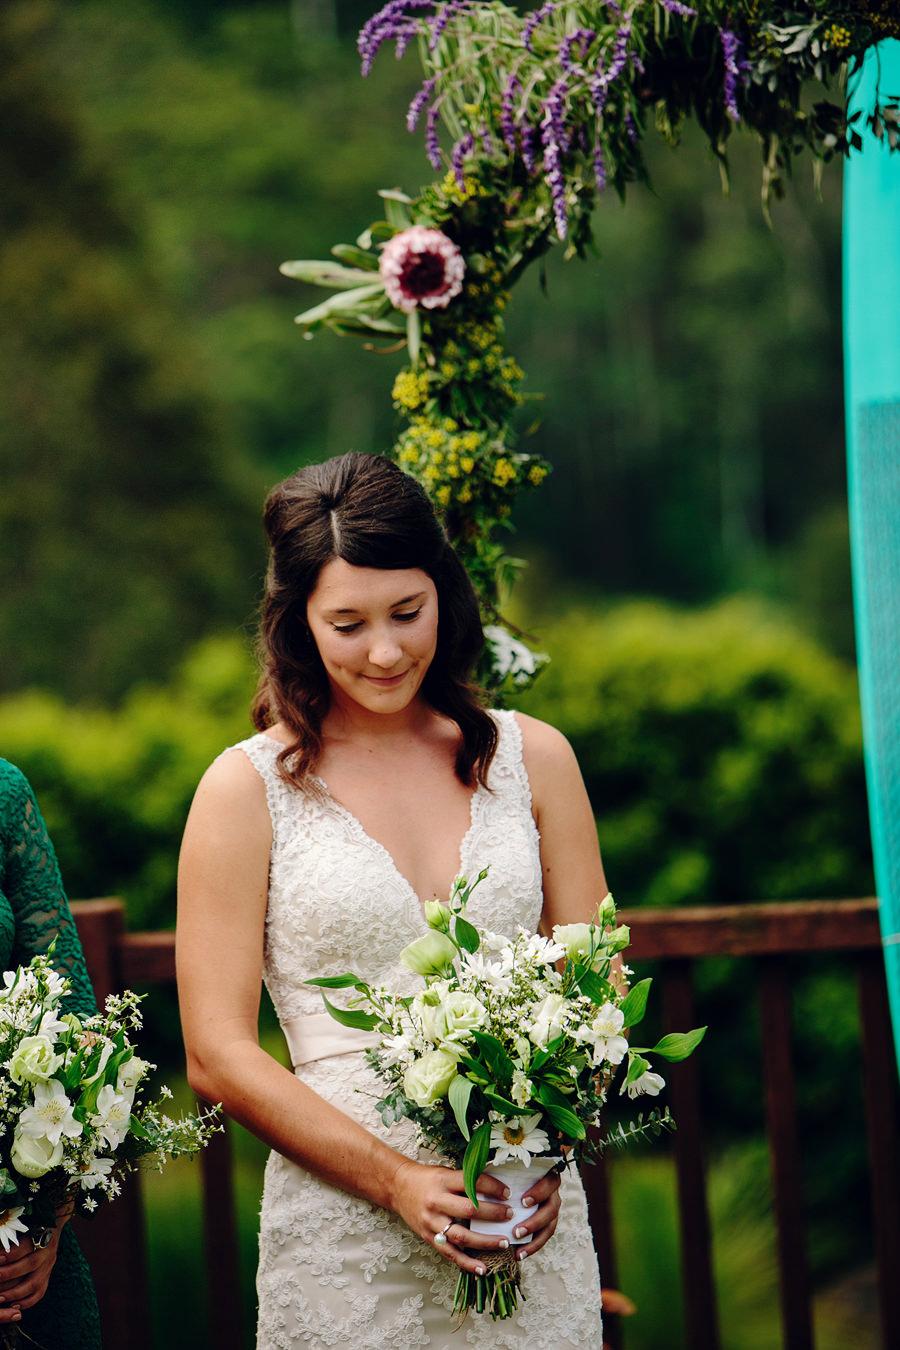 Coffs Harbour Hinterland Wedding Photographers: Ceremony